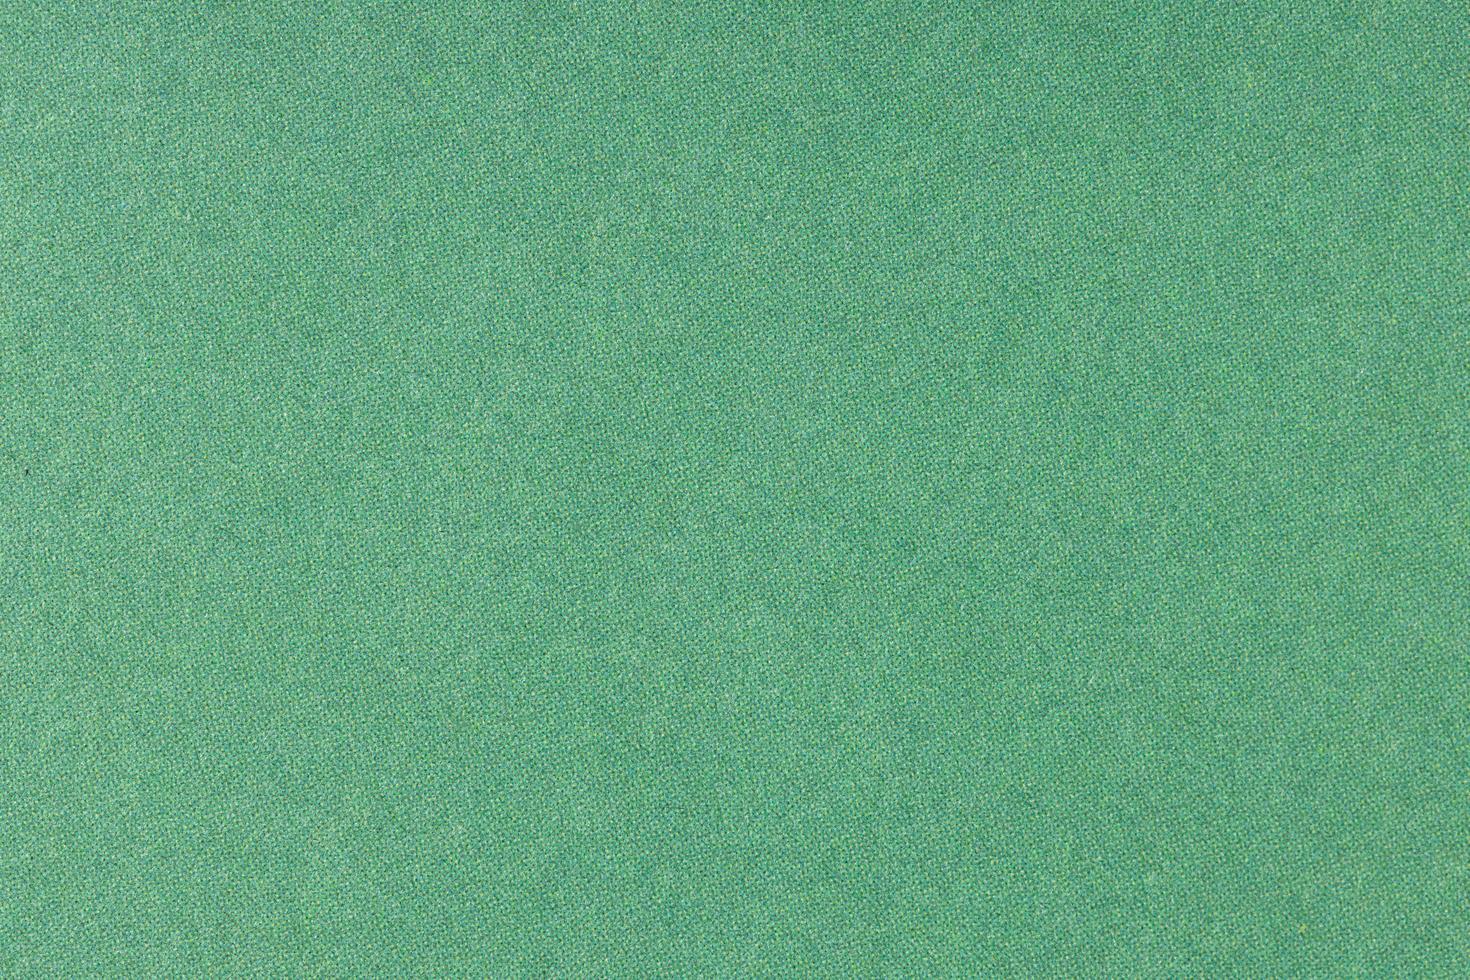 texture de fond de papier imprimé offset vert. gros plan macro. plein cadre photo